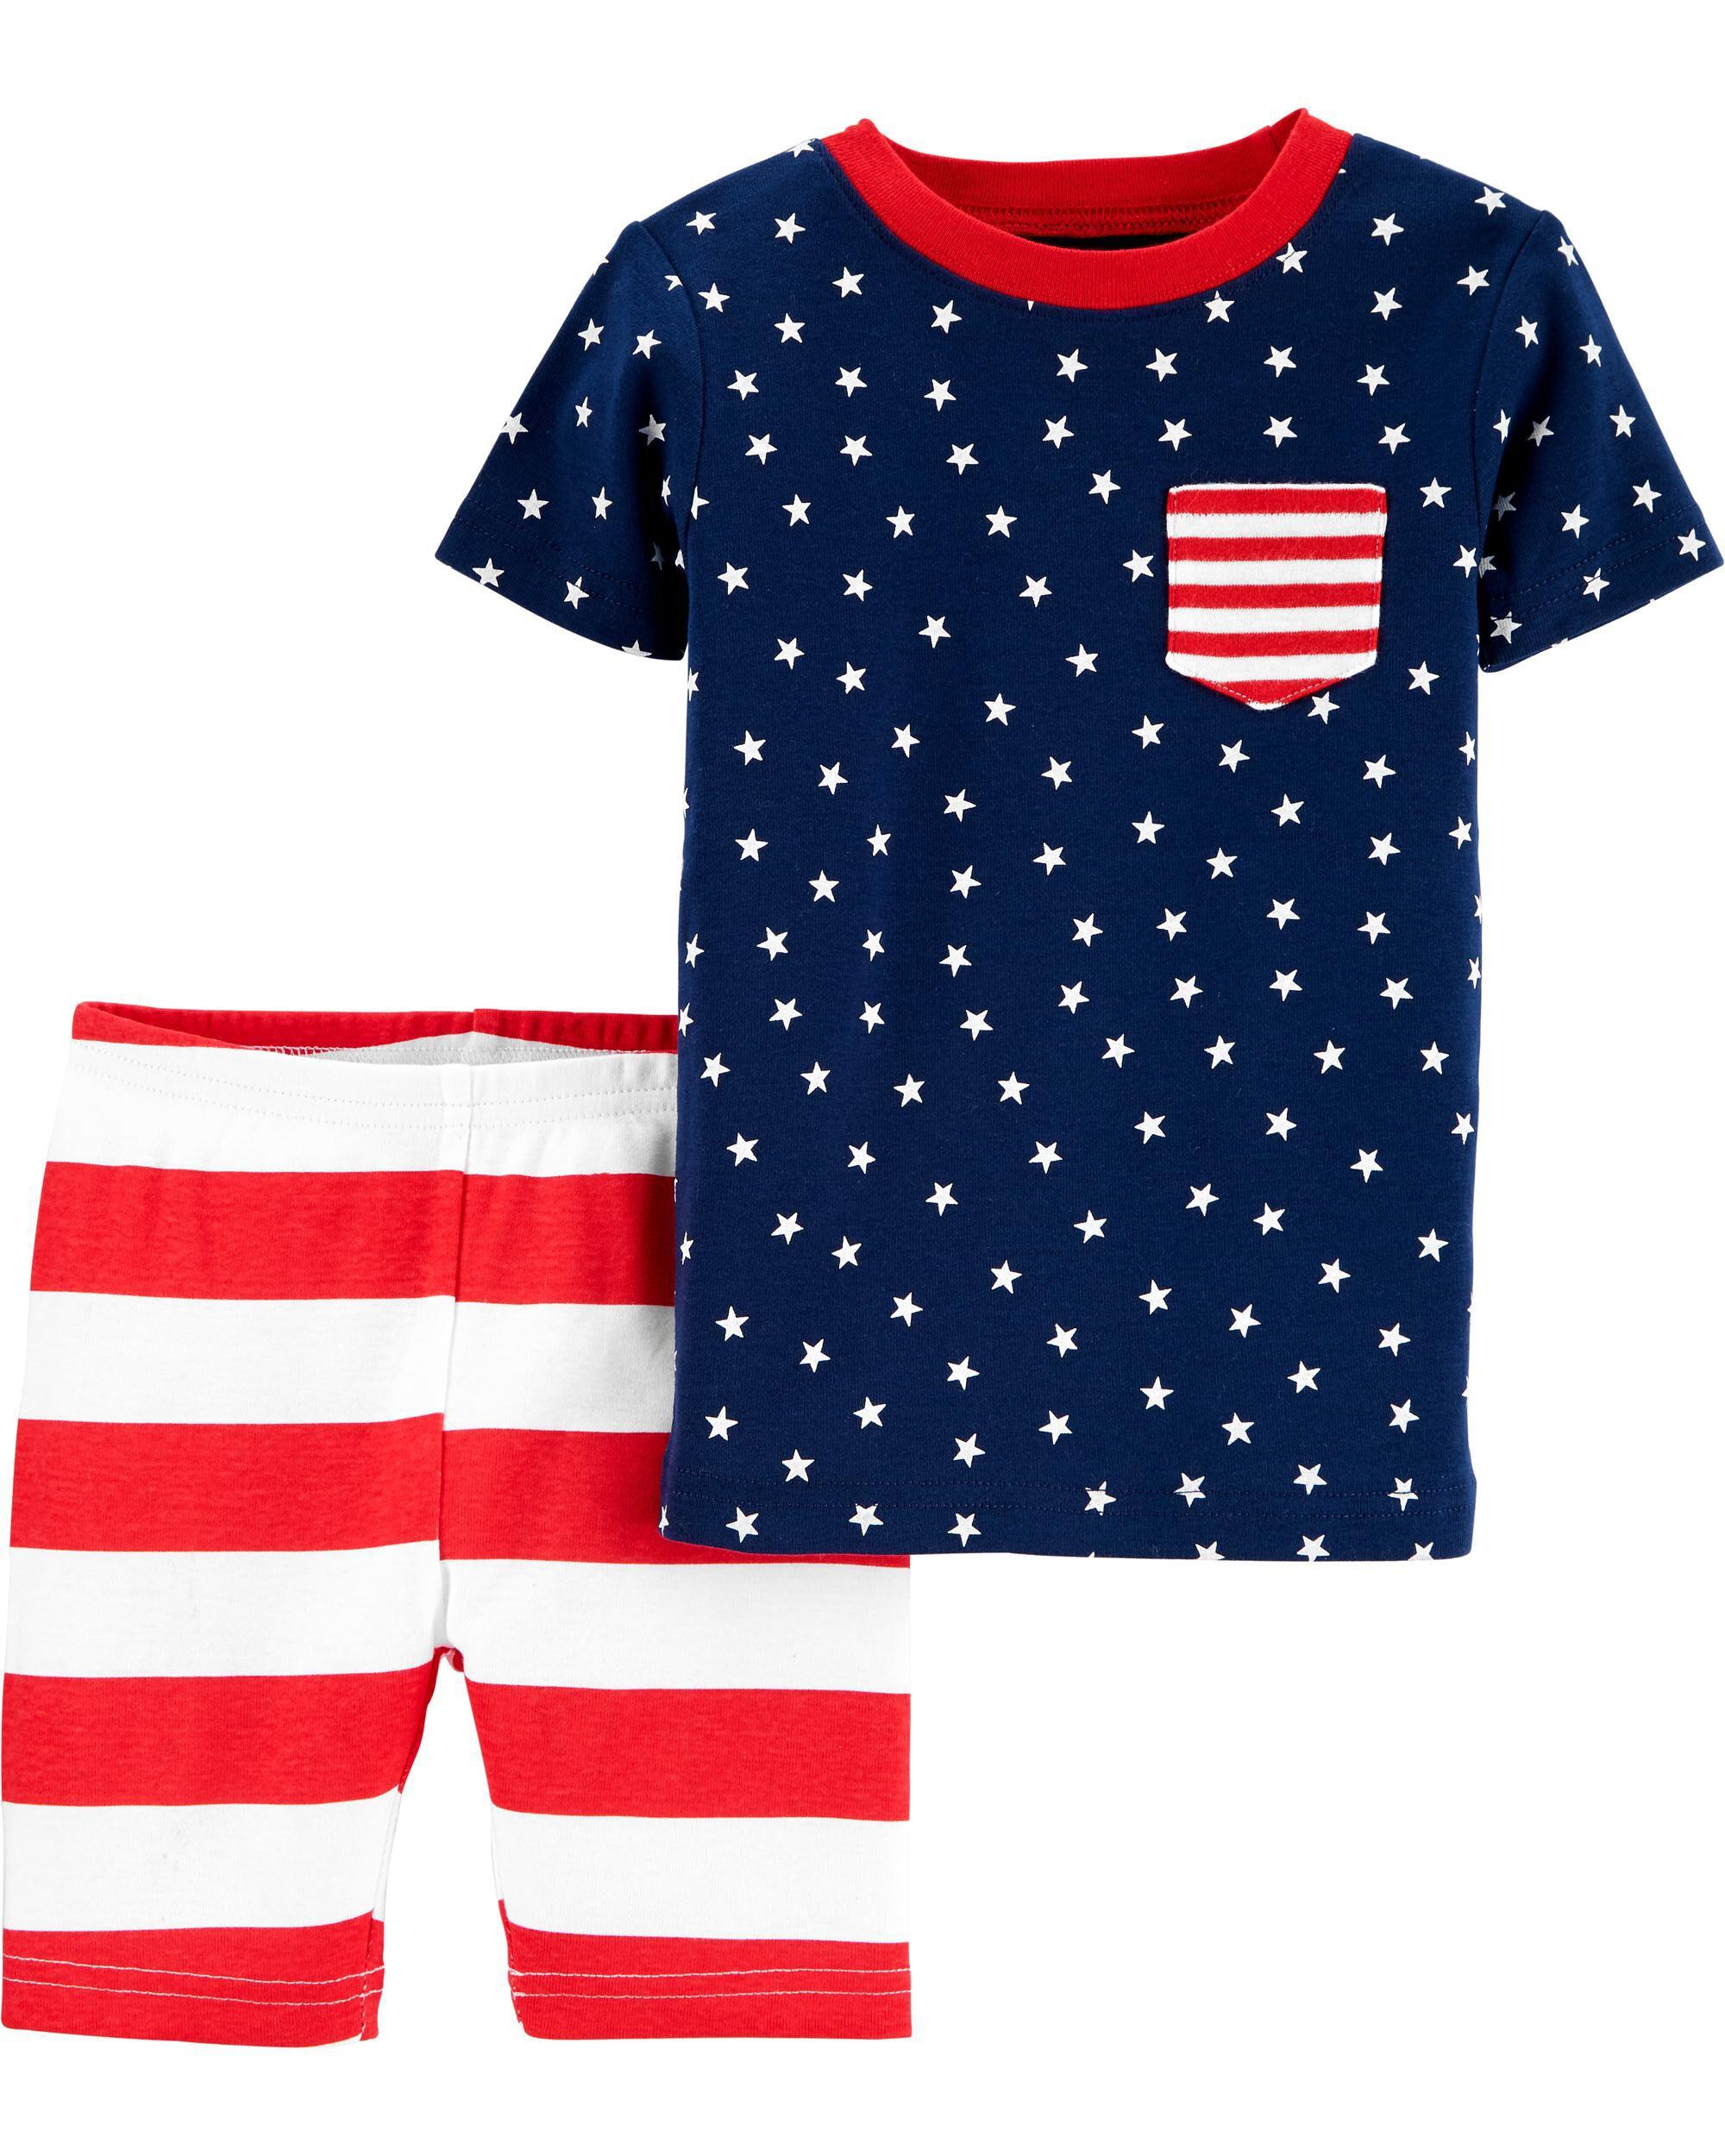 *CLEARANCE* 2-Piece American Flag Snug Fit Cotton PJs